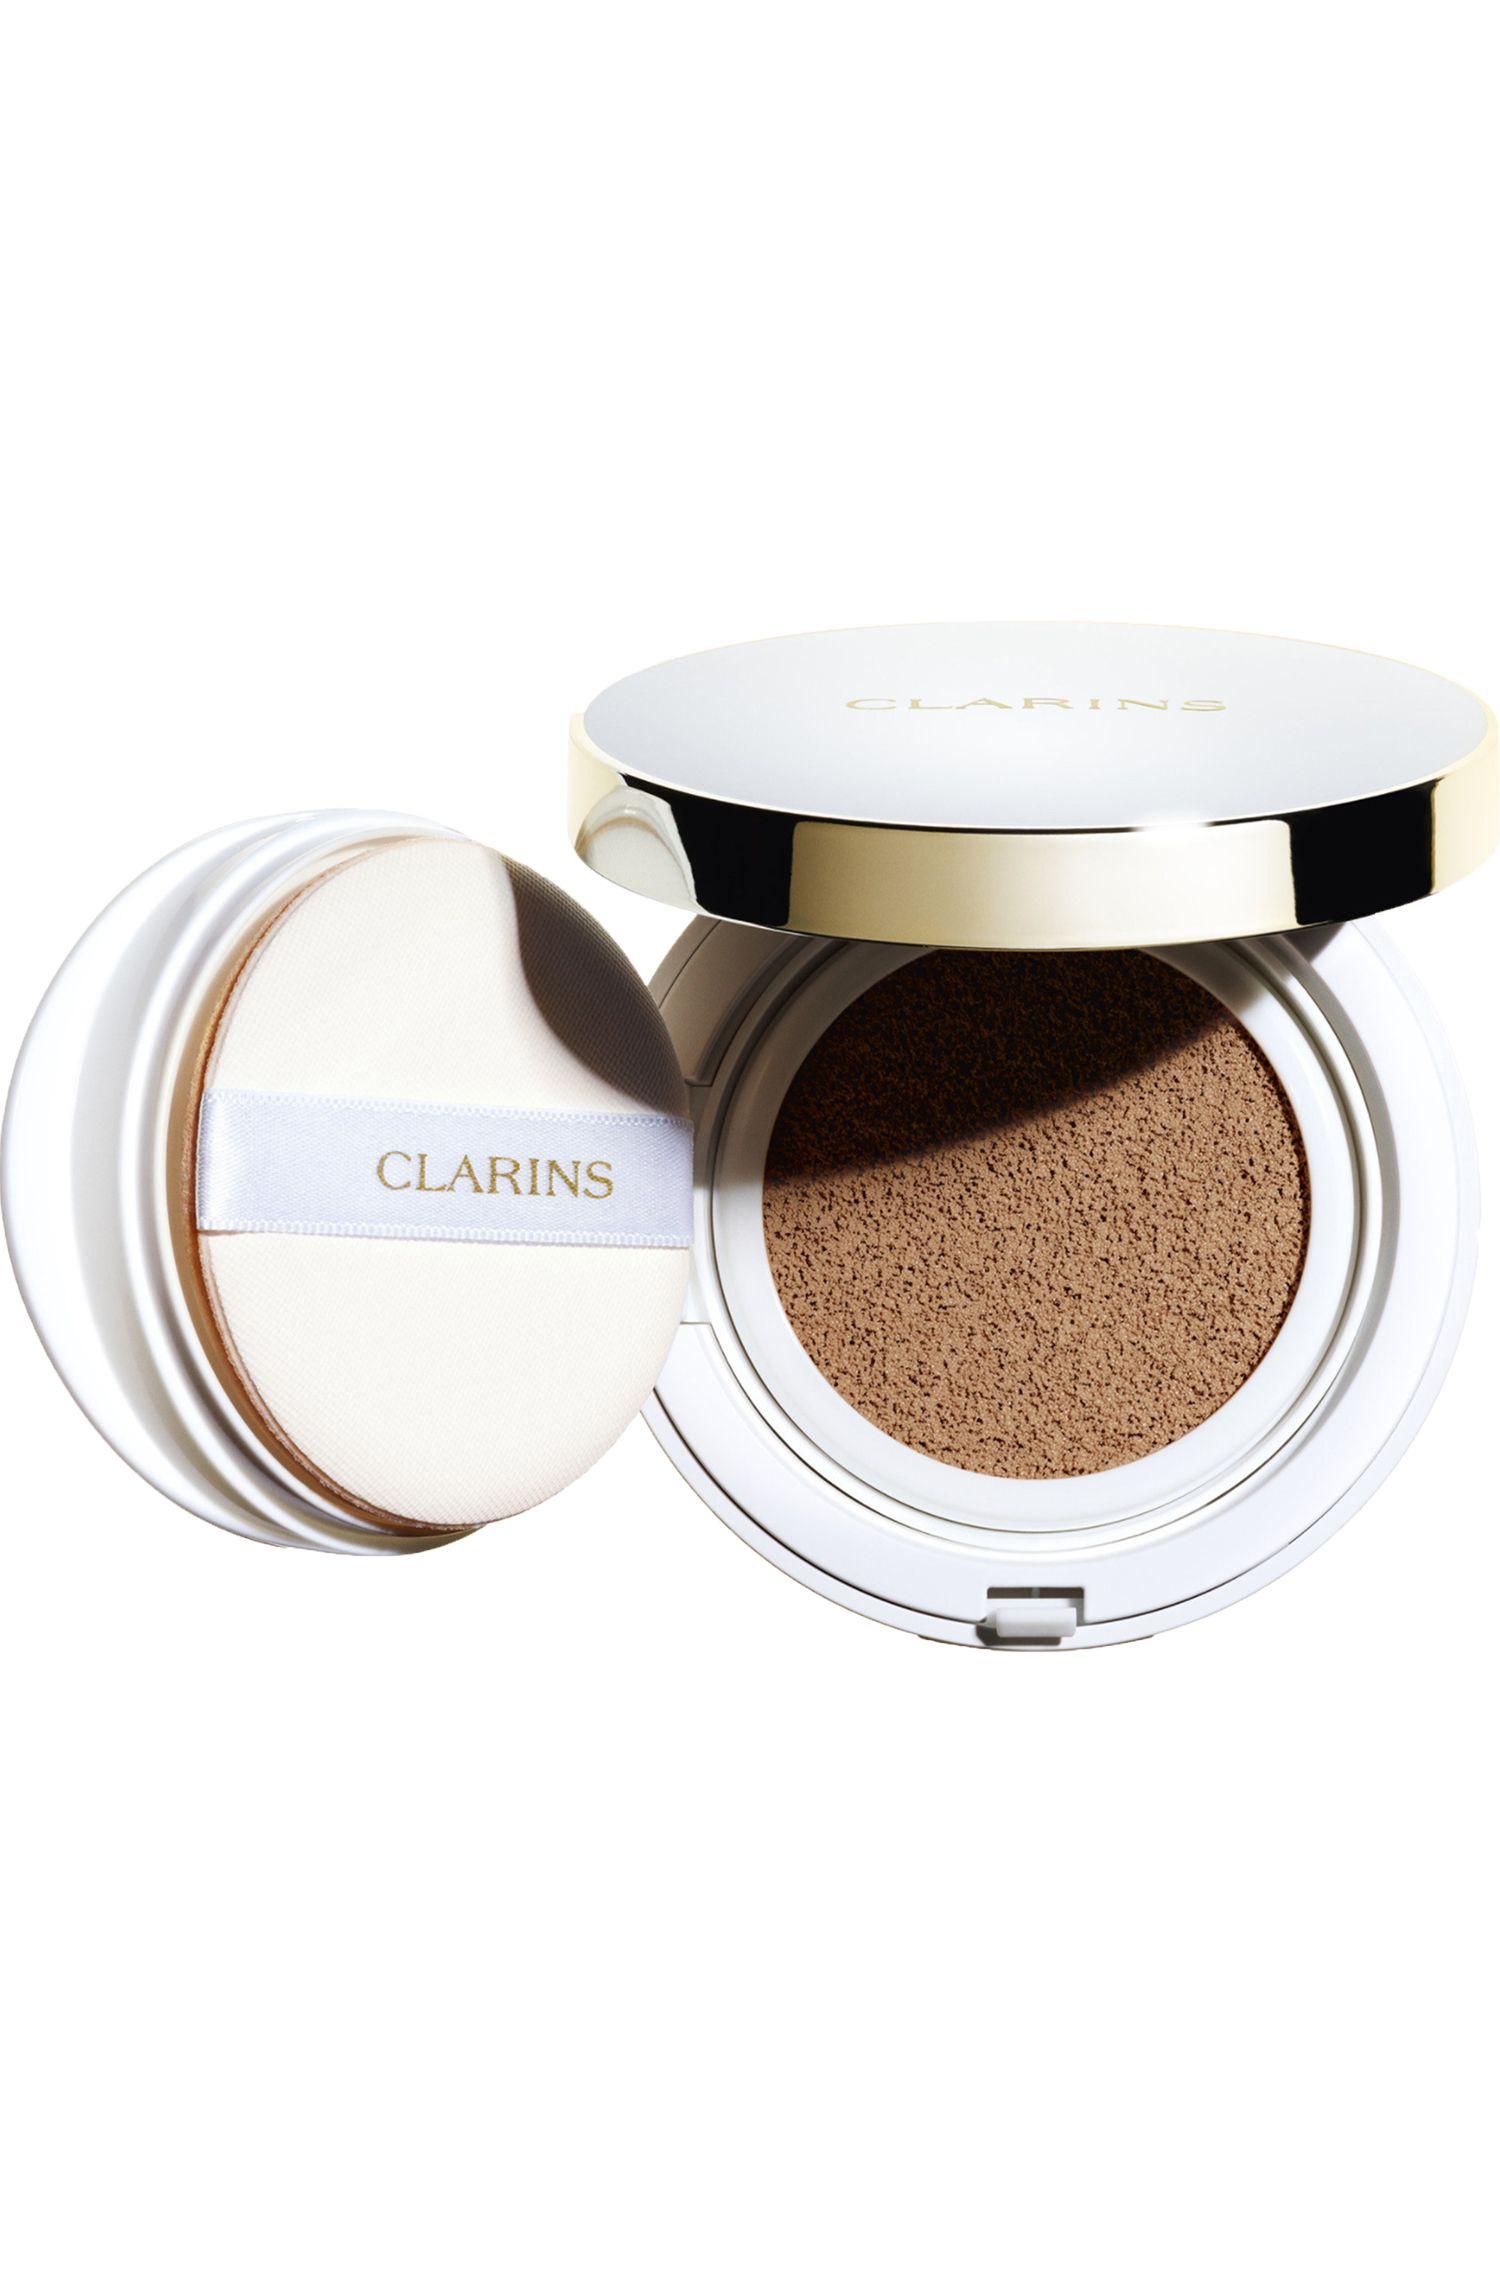 Blissim : Clarins - Fond de teint Cushion longue tenue SPF50 - 112 Amber